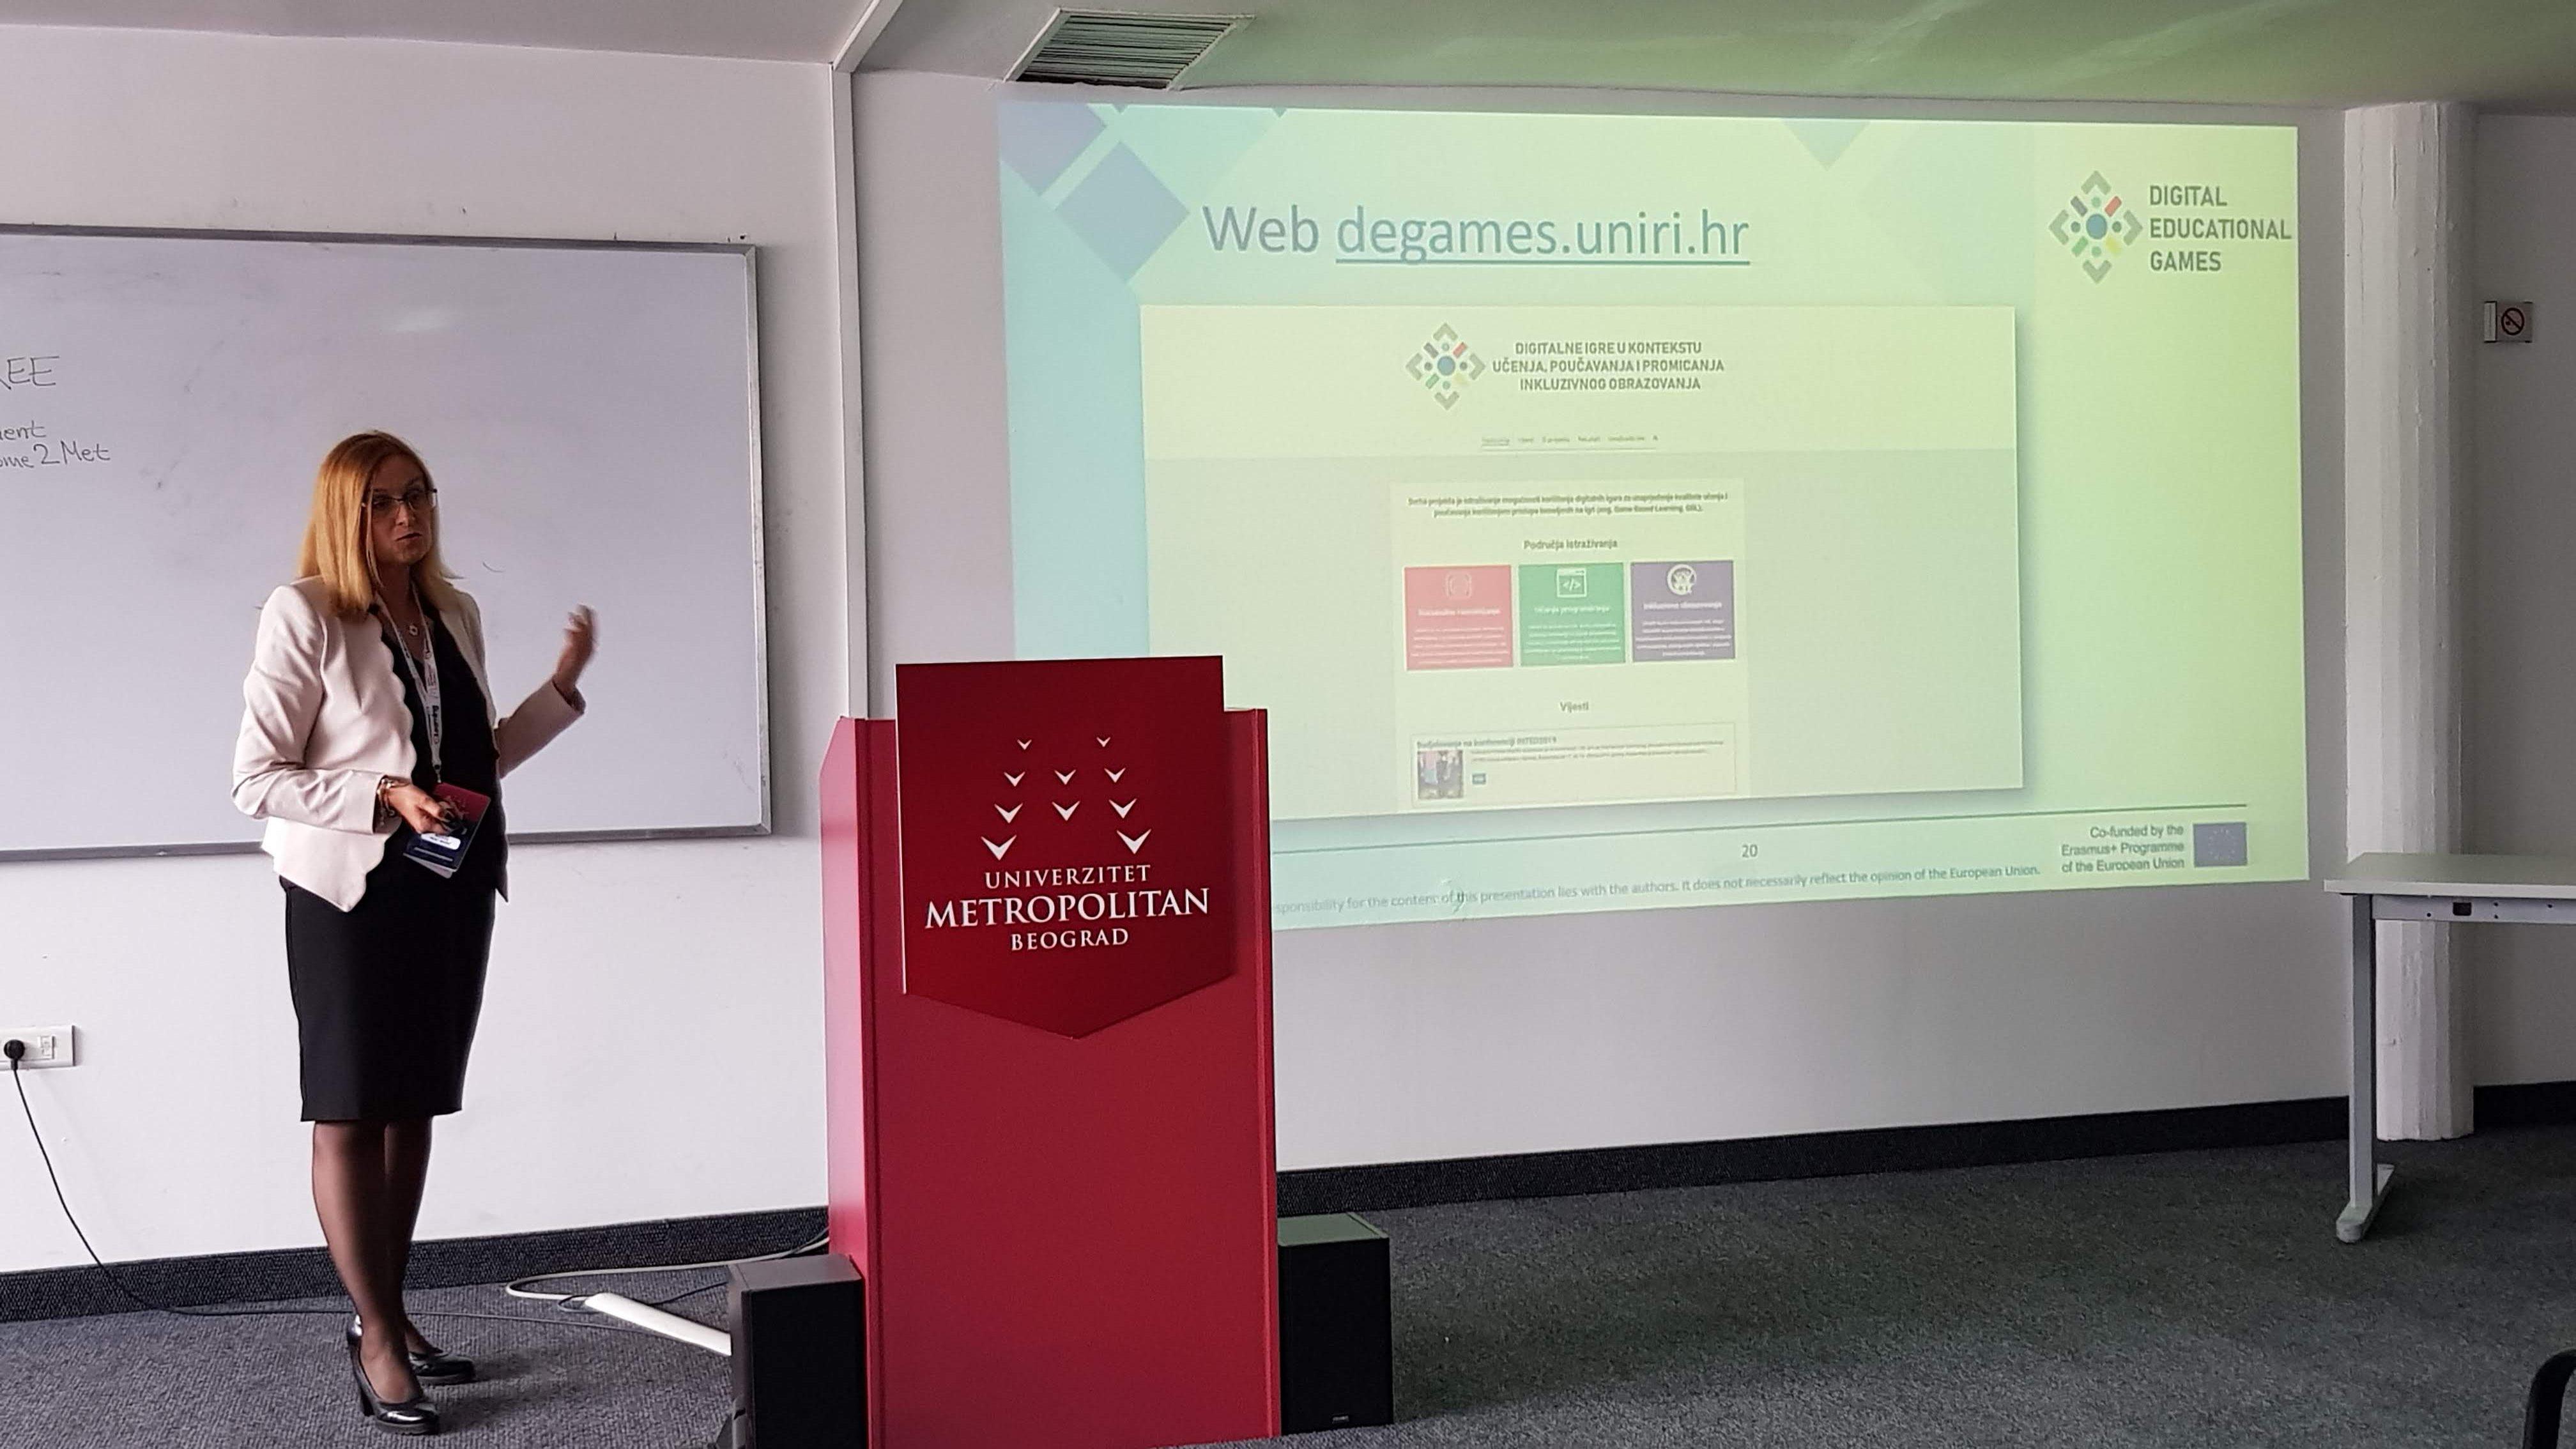 Prezentacija projekta na eLearning 2019 konferenciji